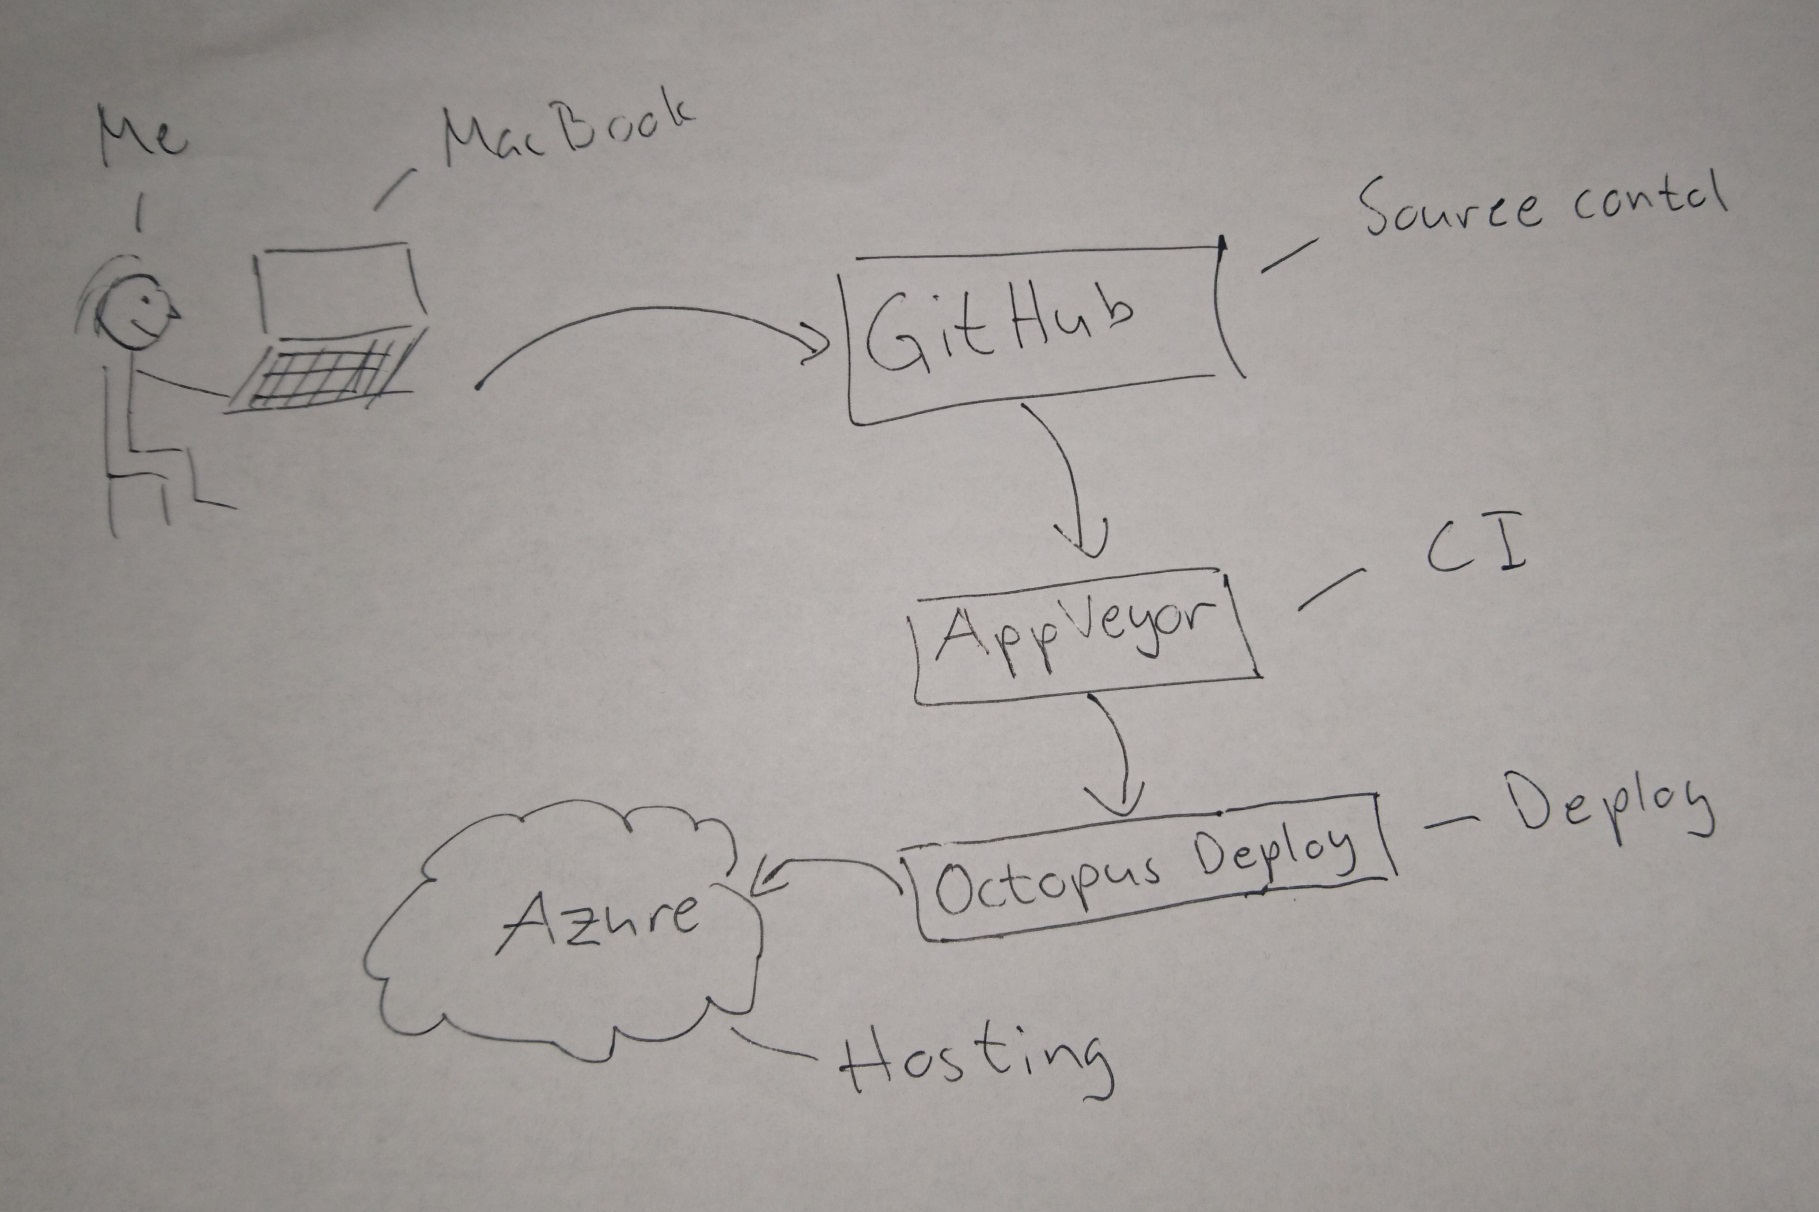 The build deploy process